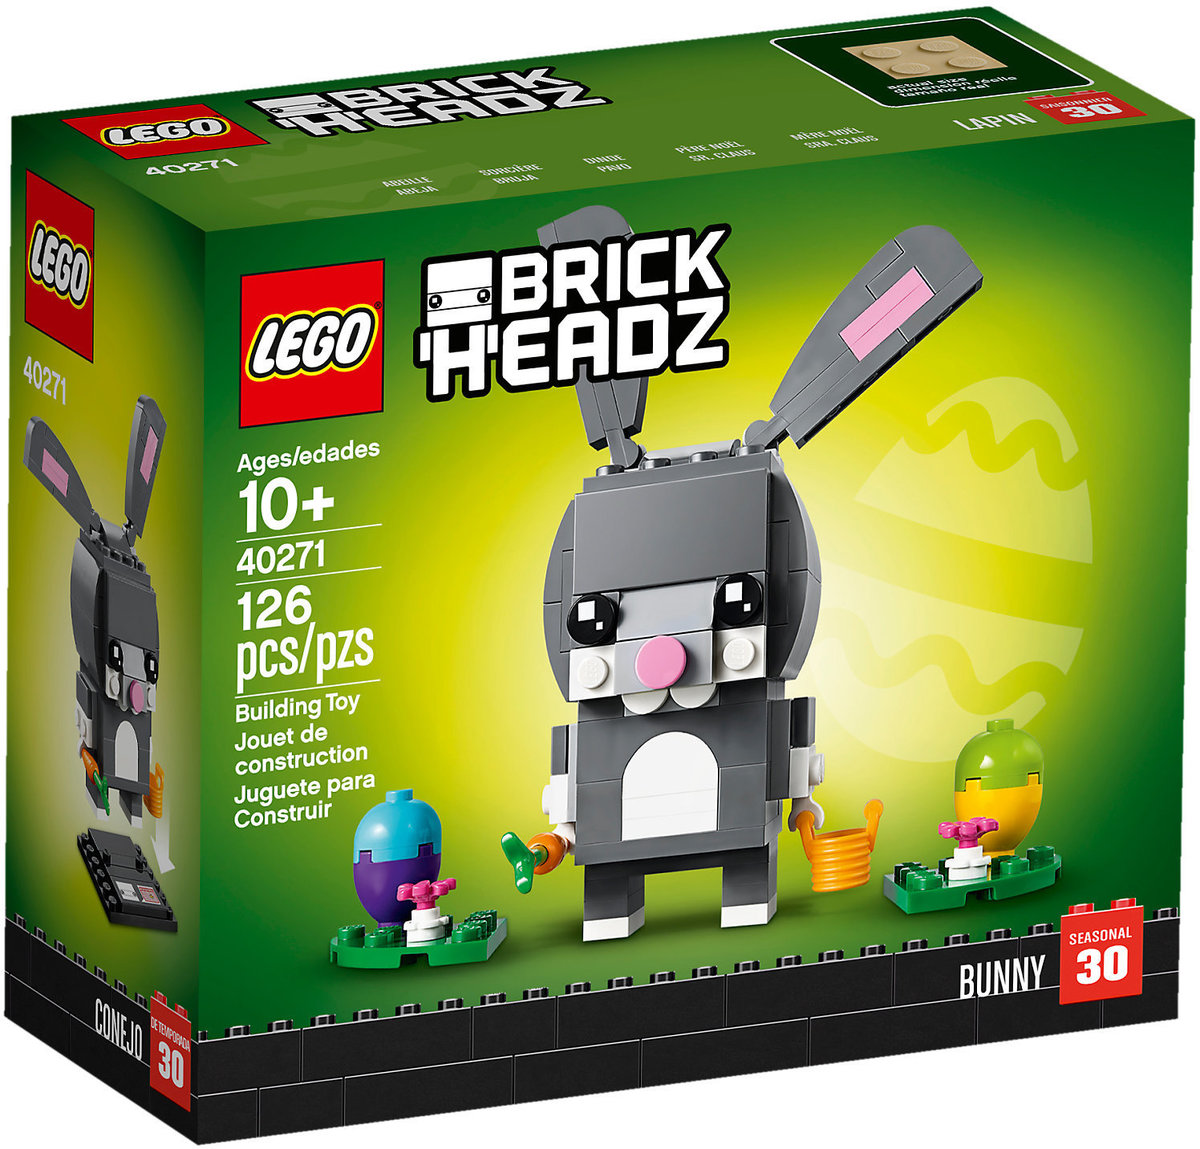 LEGO 40271 BrickHeadz - Easter Bunny